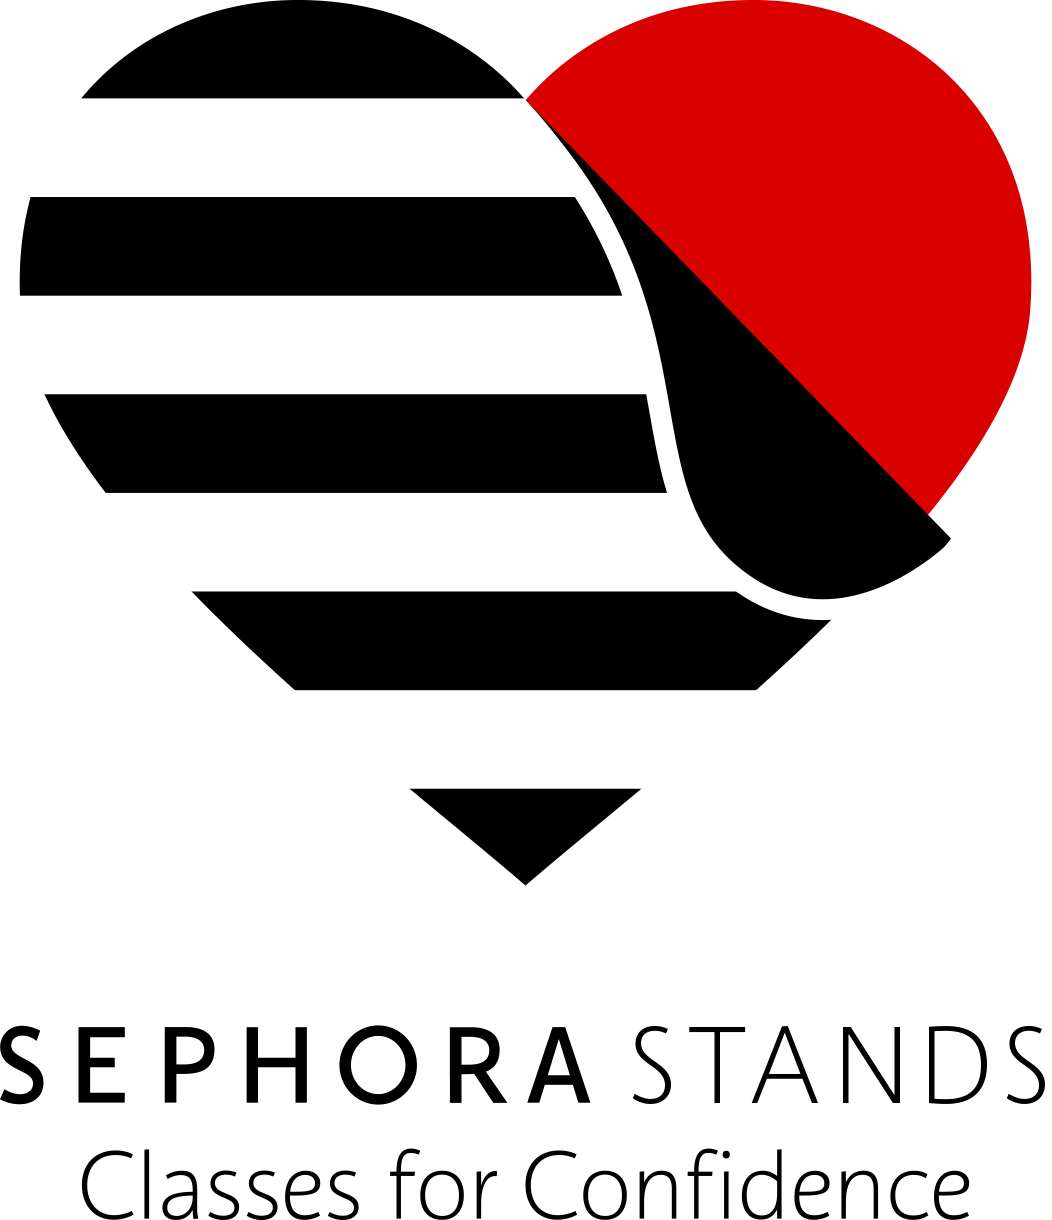 SephoraStands_C4C_final.jpg